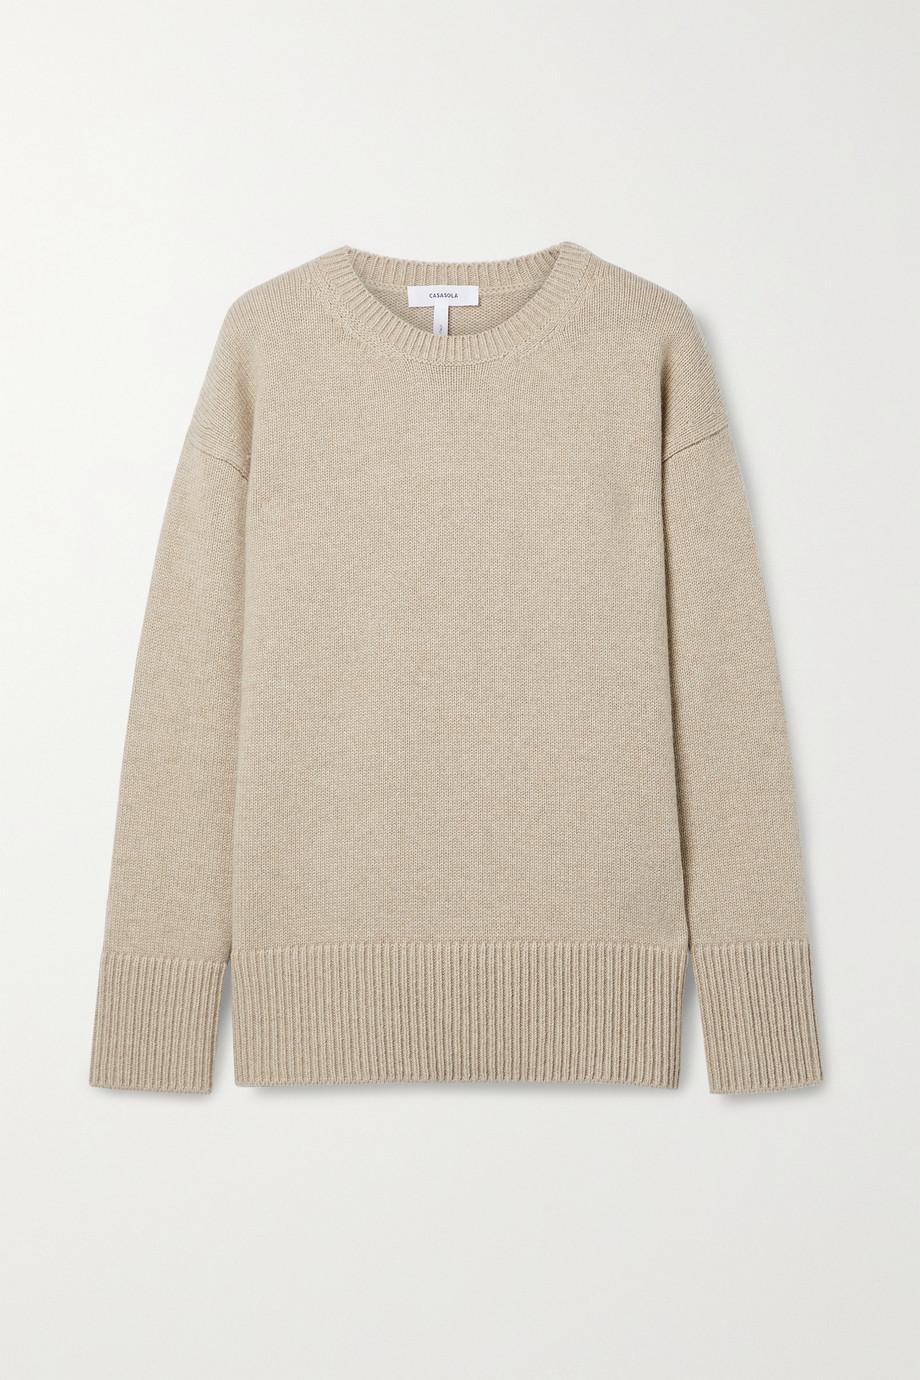 CASASOLA + NET SUSTAIN Guga cashmere sweater